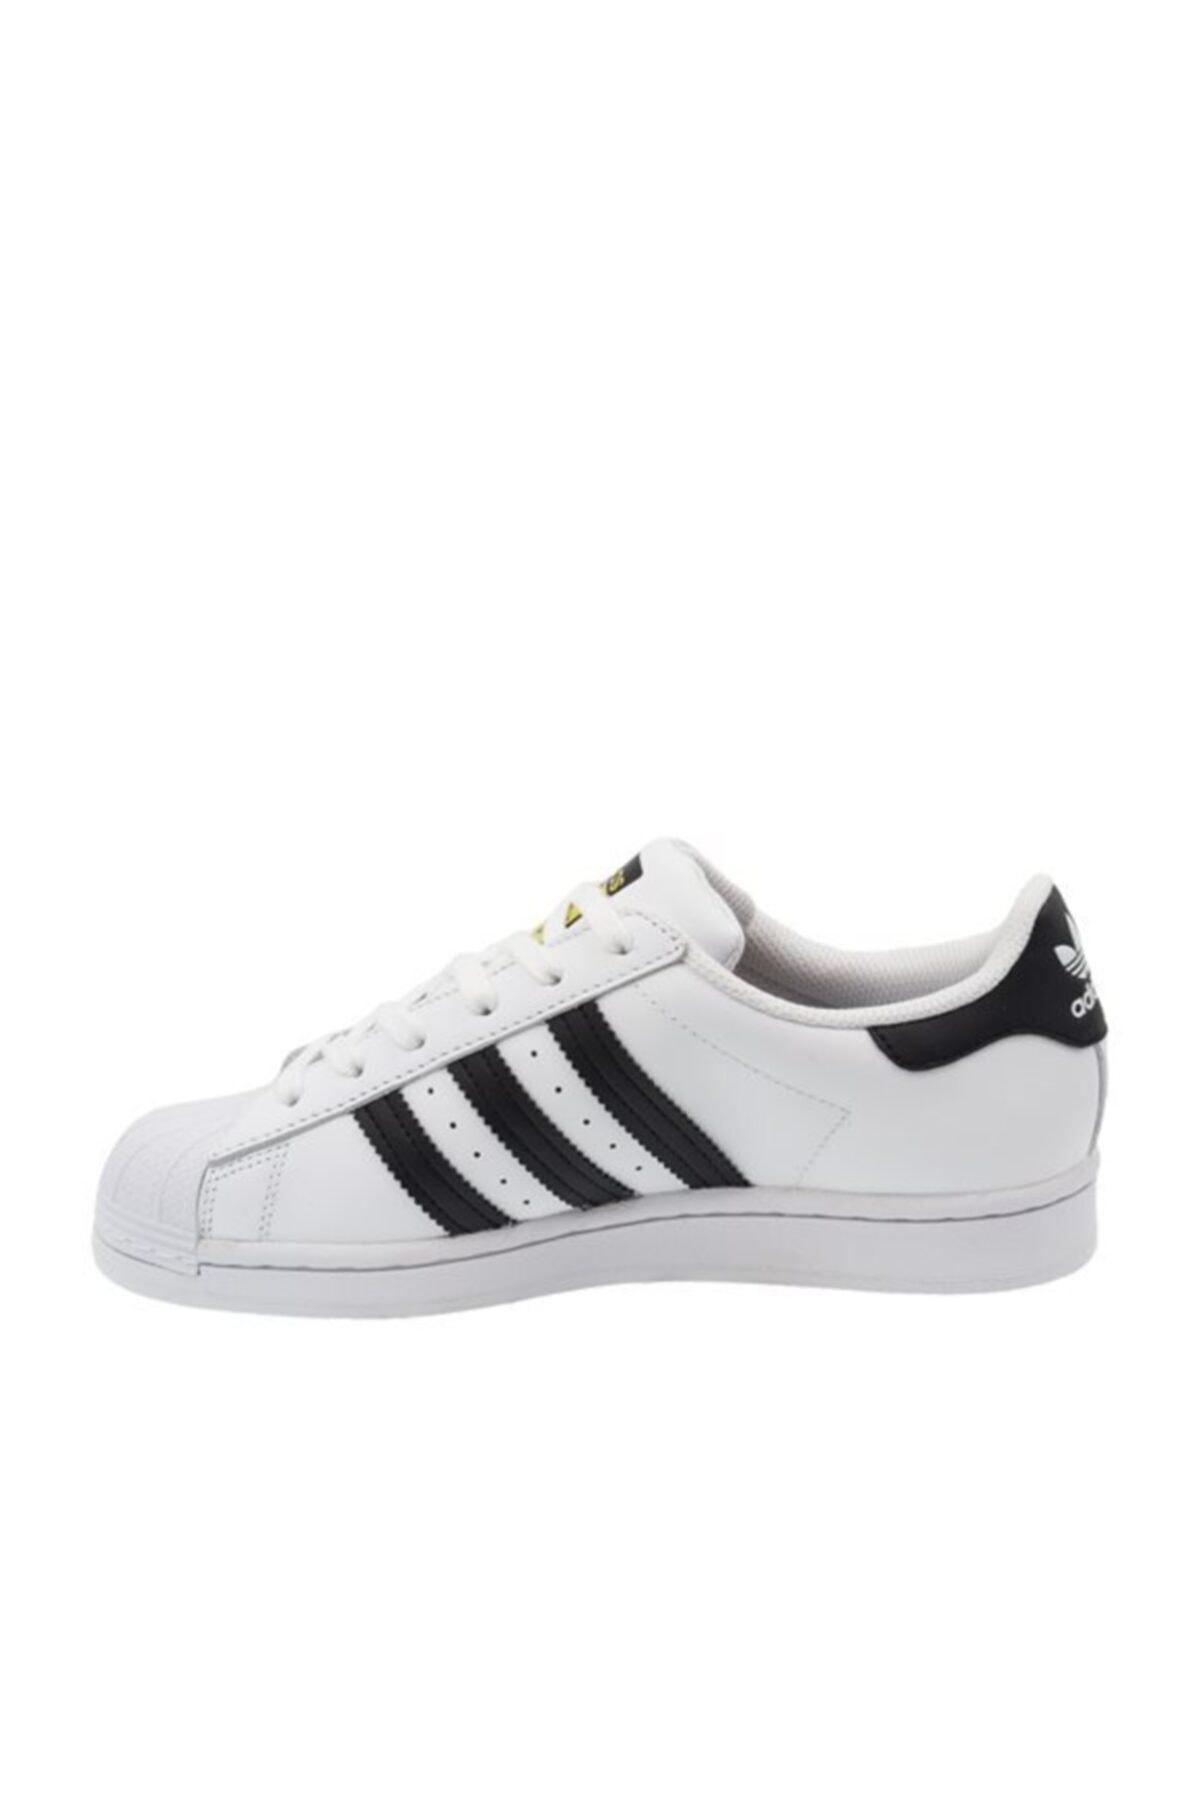 adidas Superstar (Gs) Spor Ayakkabı 2